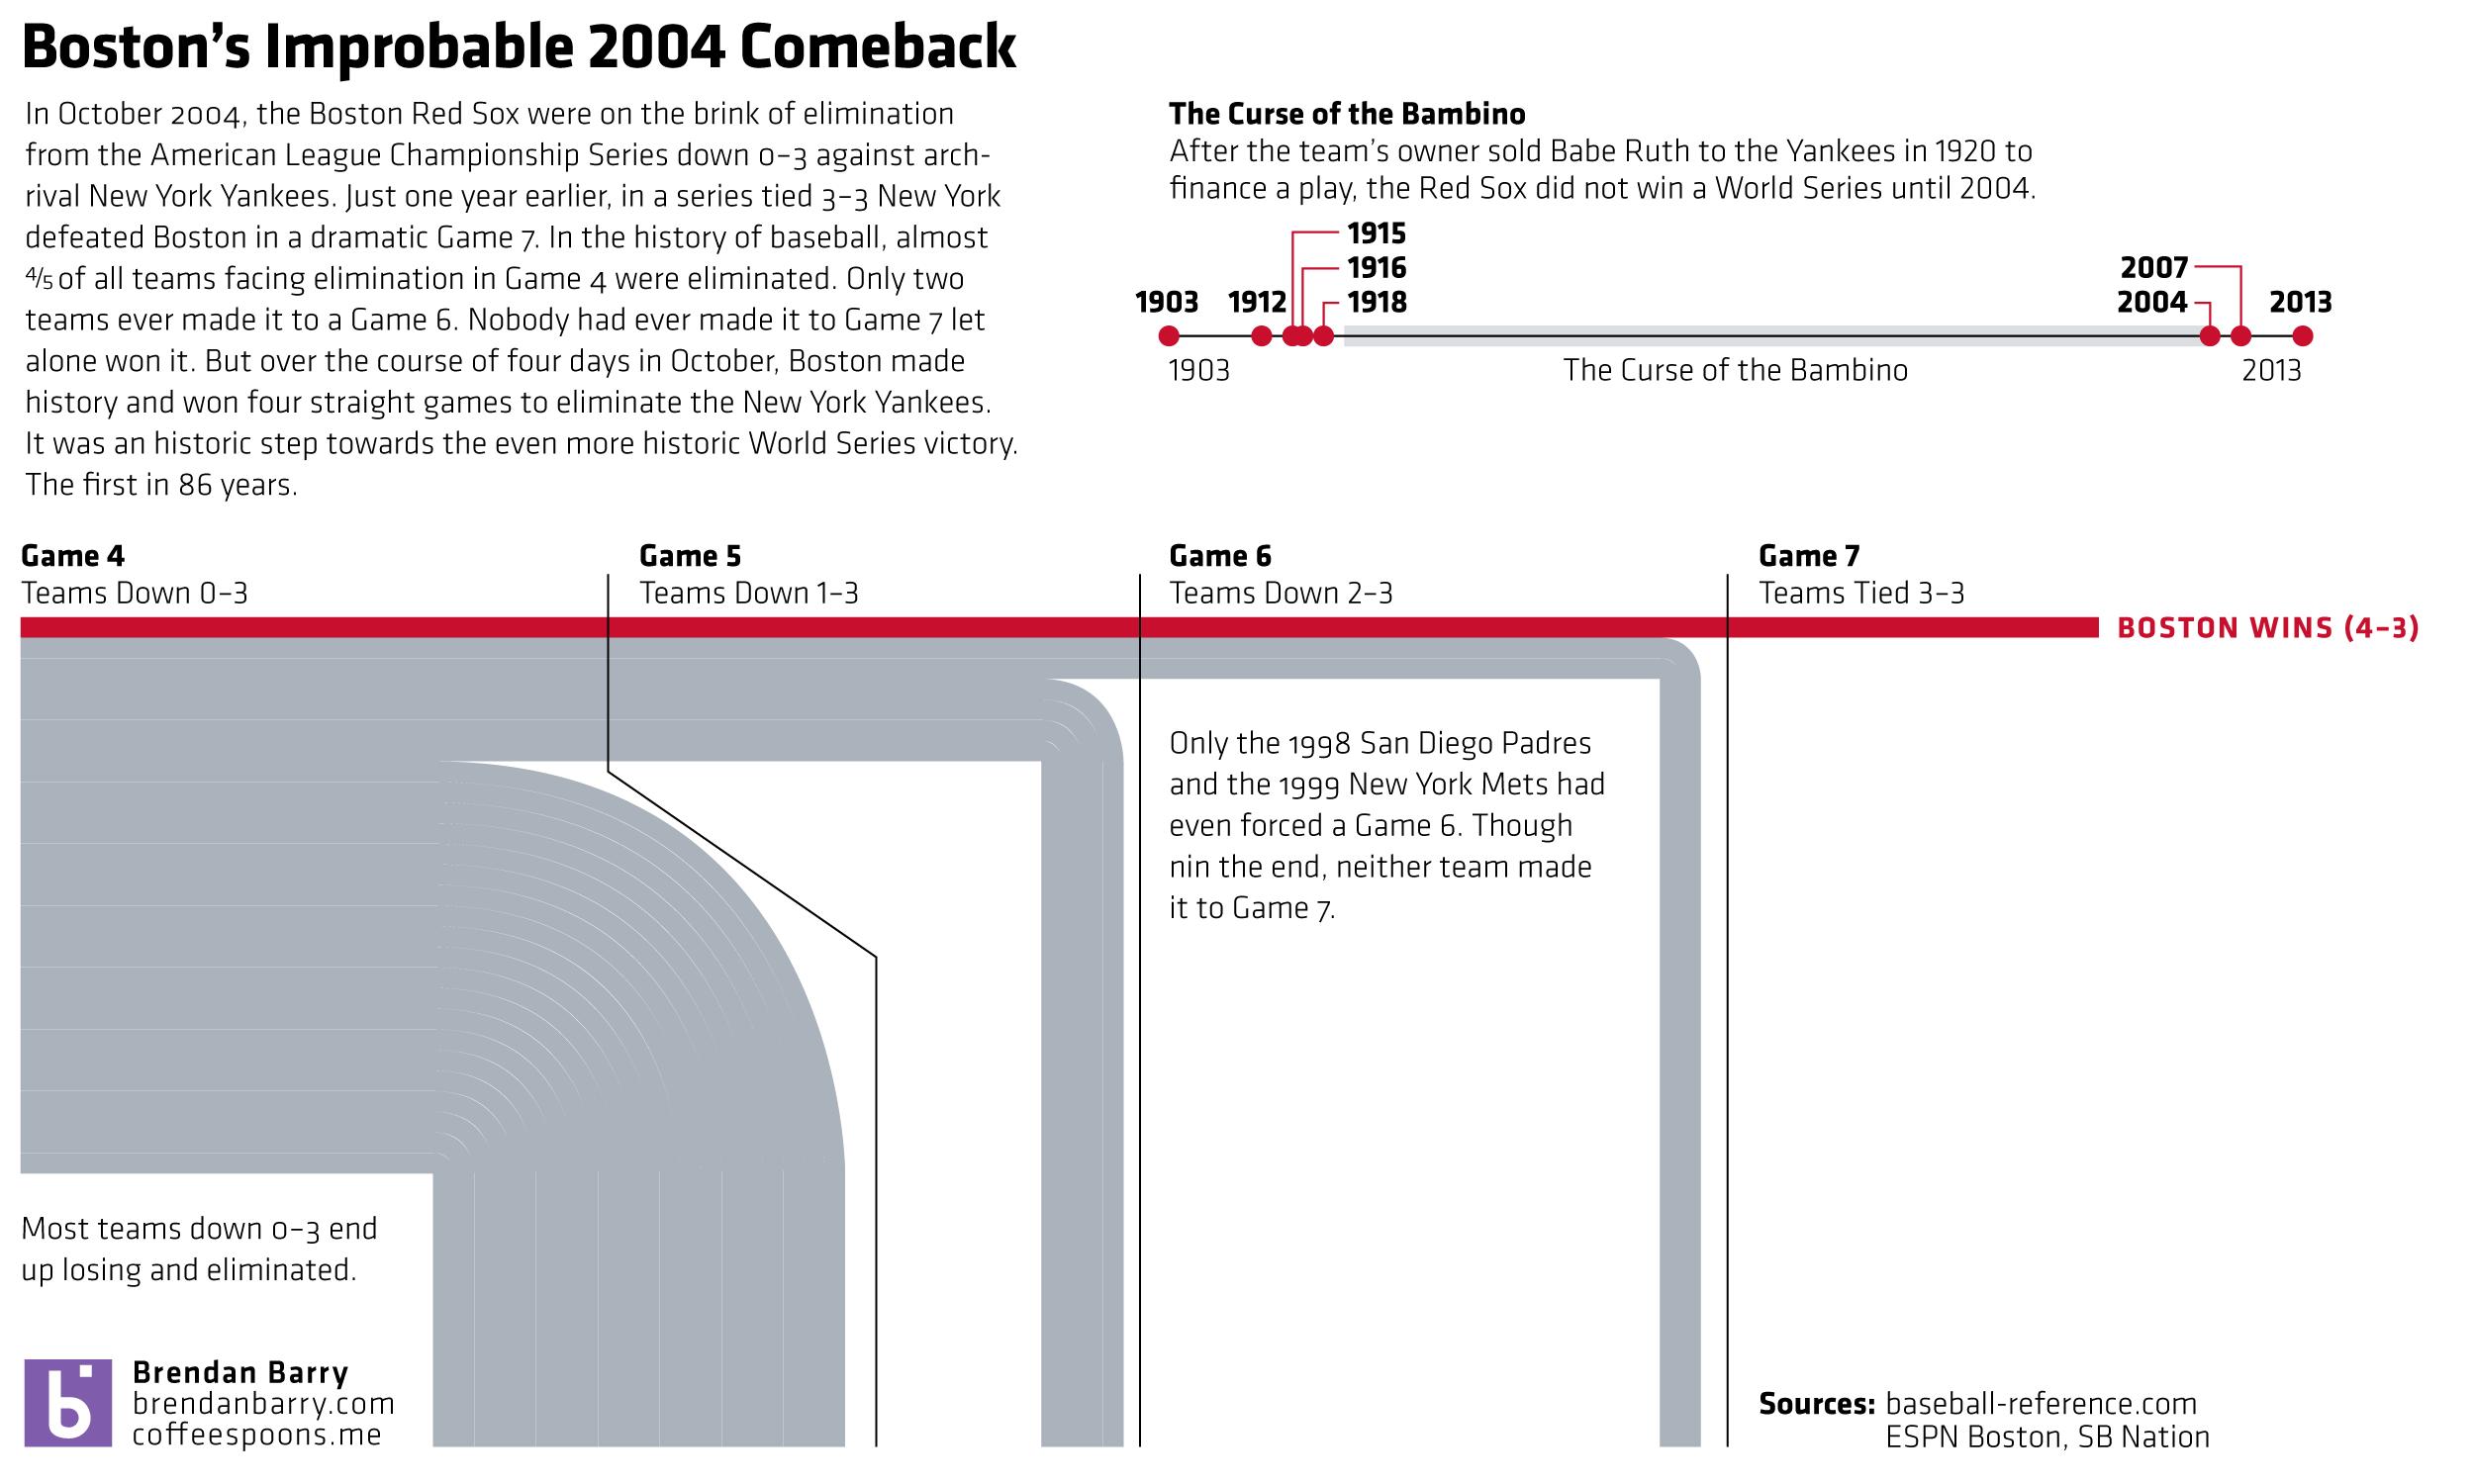 The improbable comeback